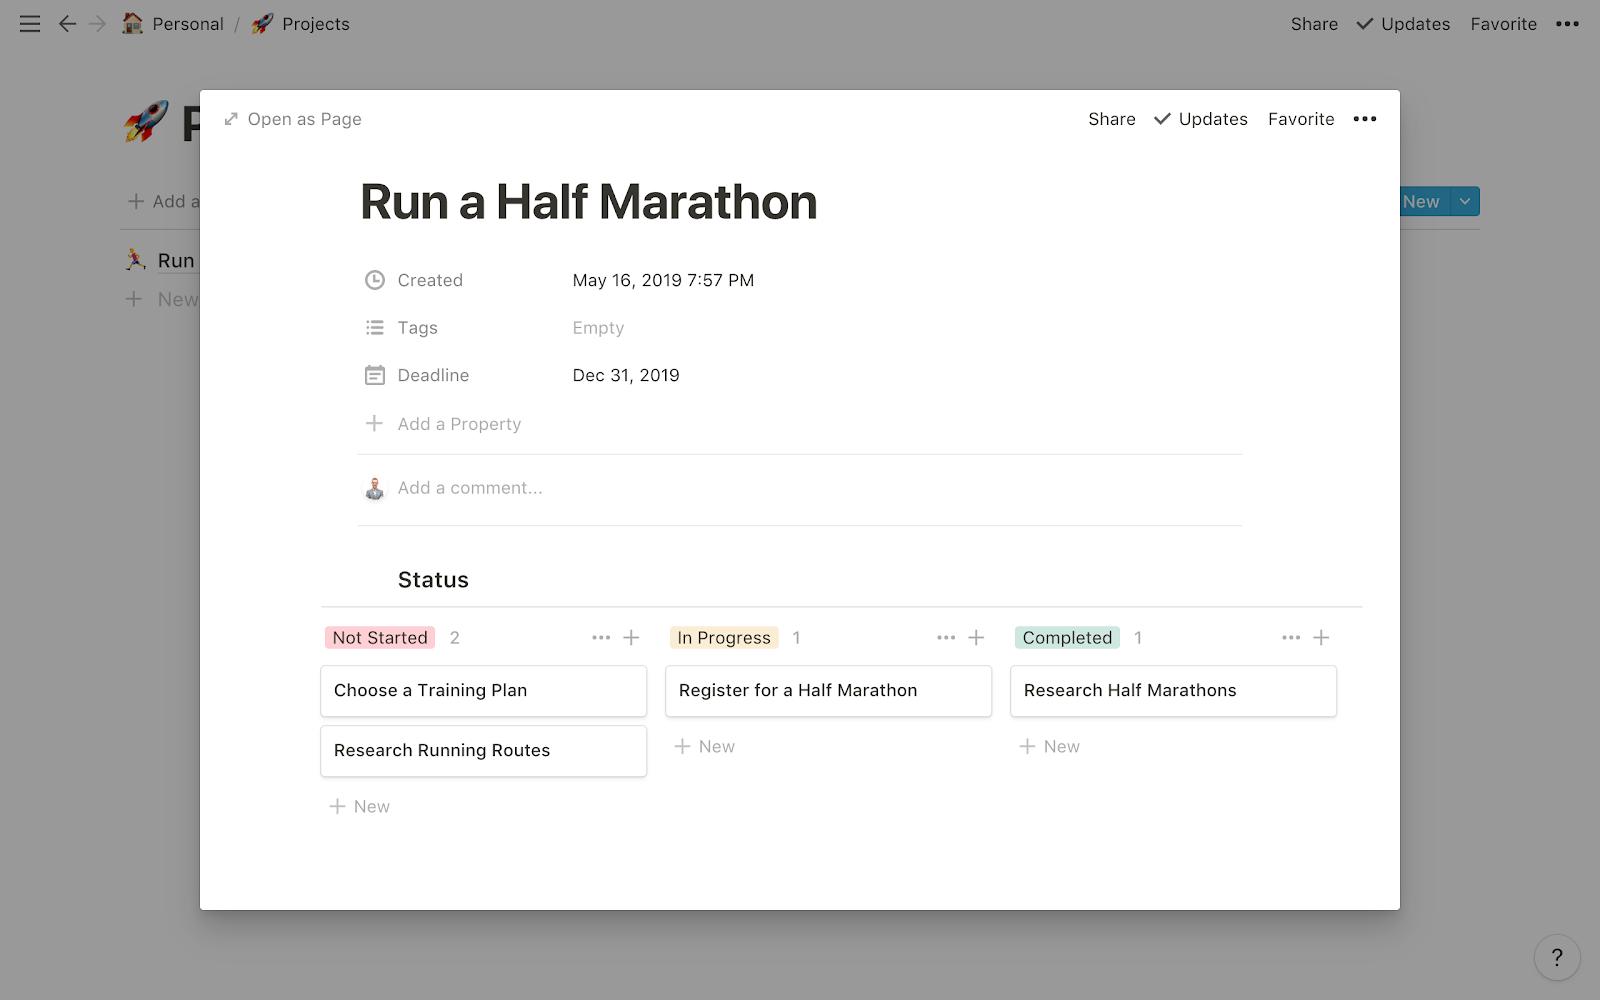 Run a Half Marathon